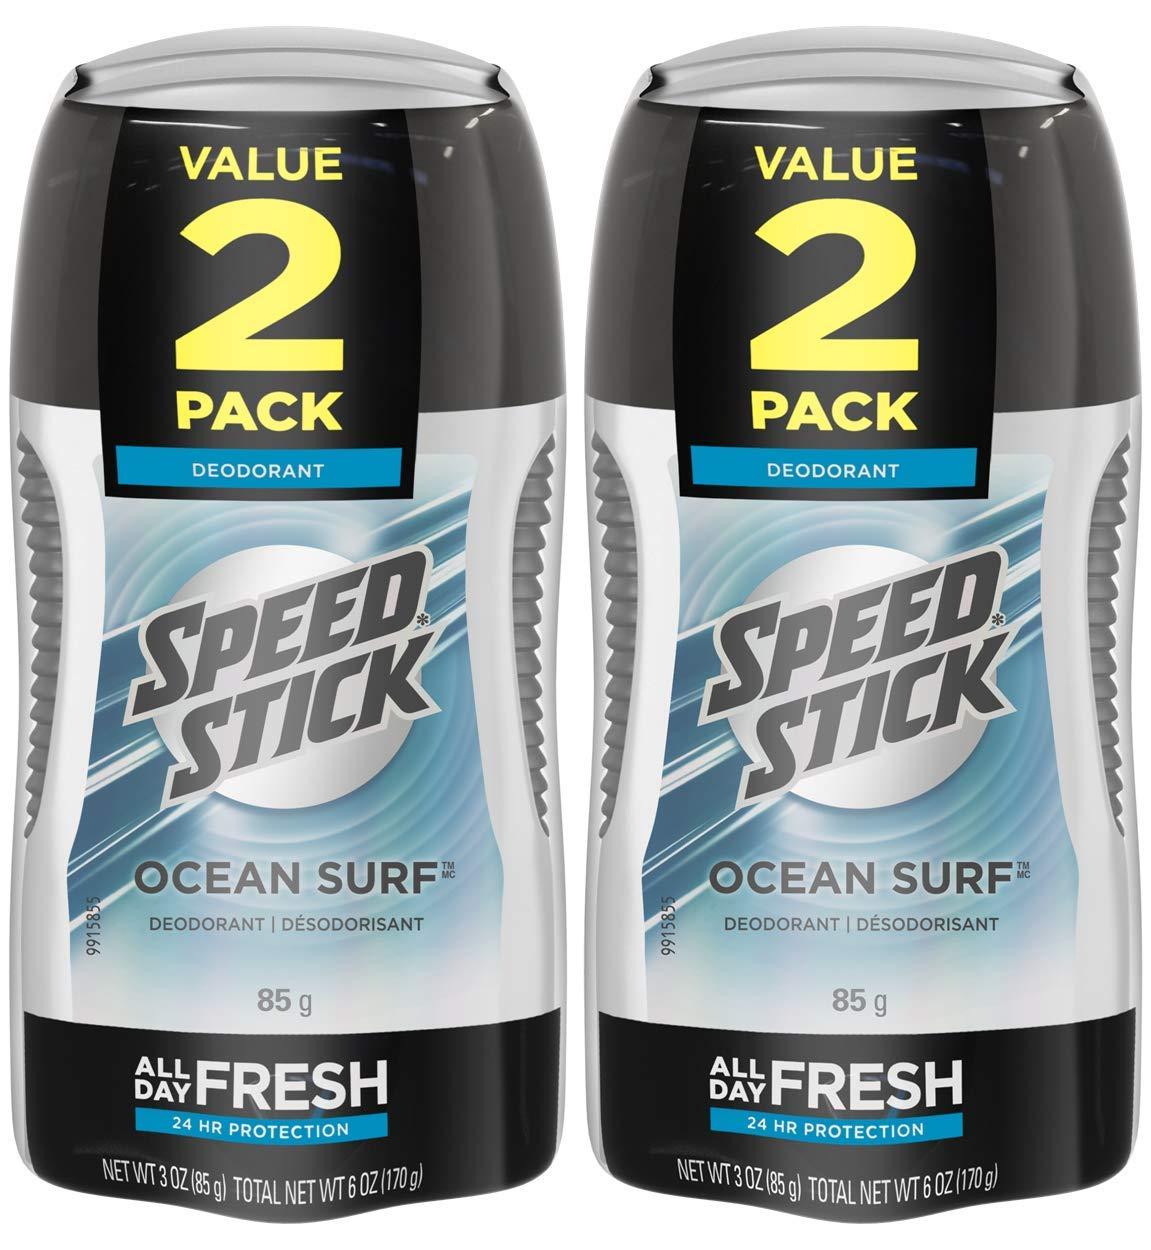 Speed Stick Deodorant for Men, Ocean Surf - 3 Ounce (4 Pack)